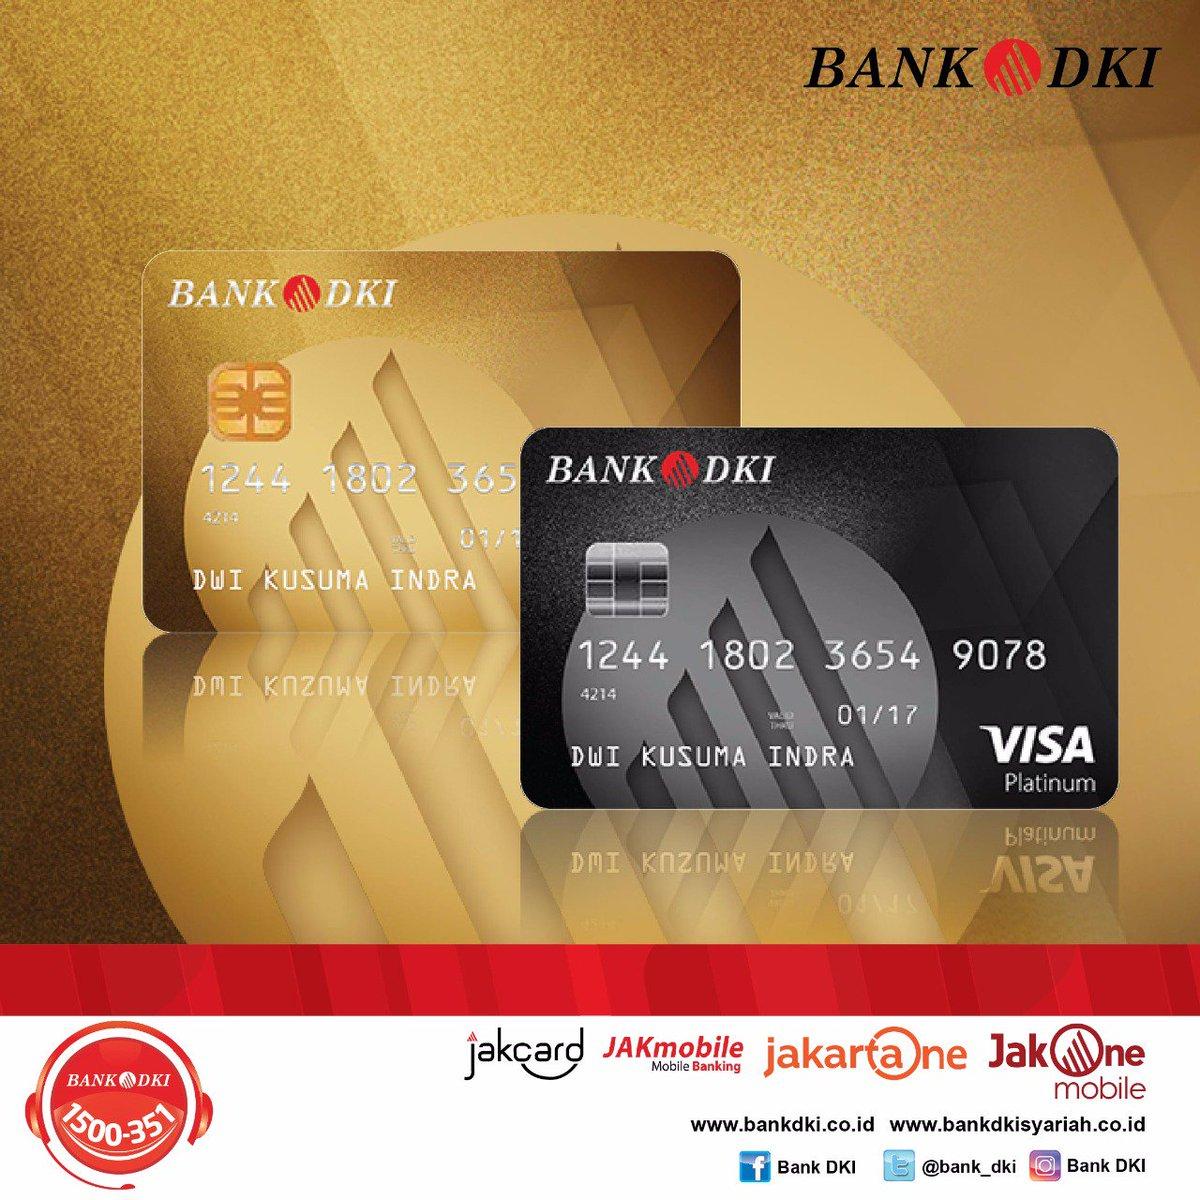 Bank Dki On Twitter Yuk Apply Kartu Kredit Co Branding Bank Dki